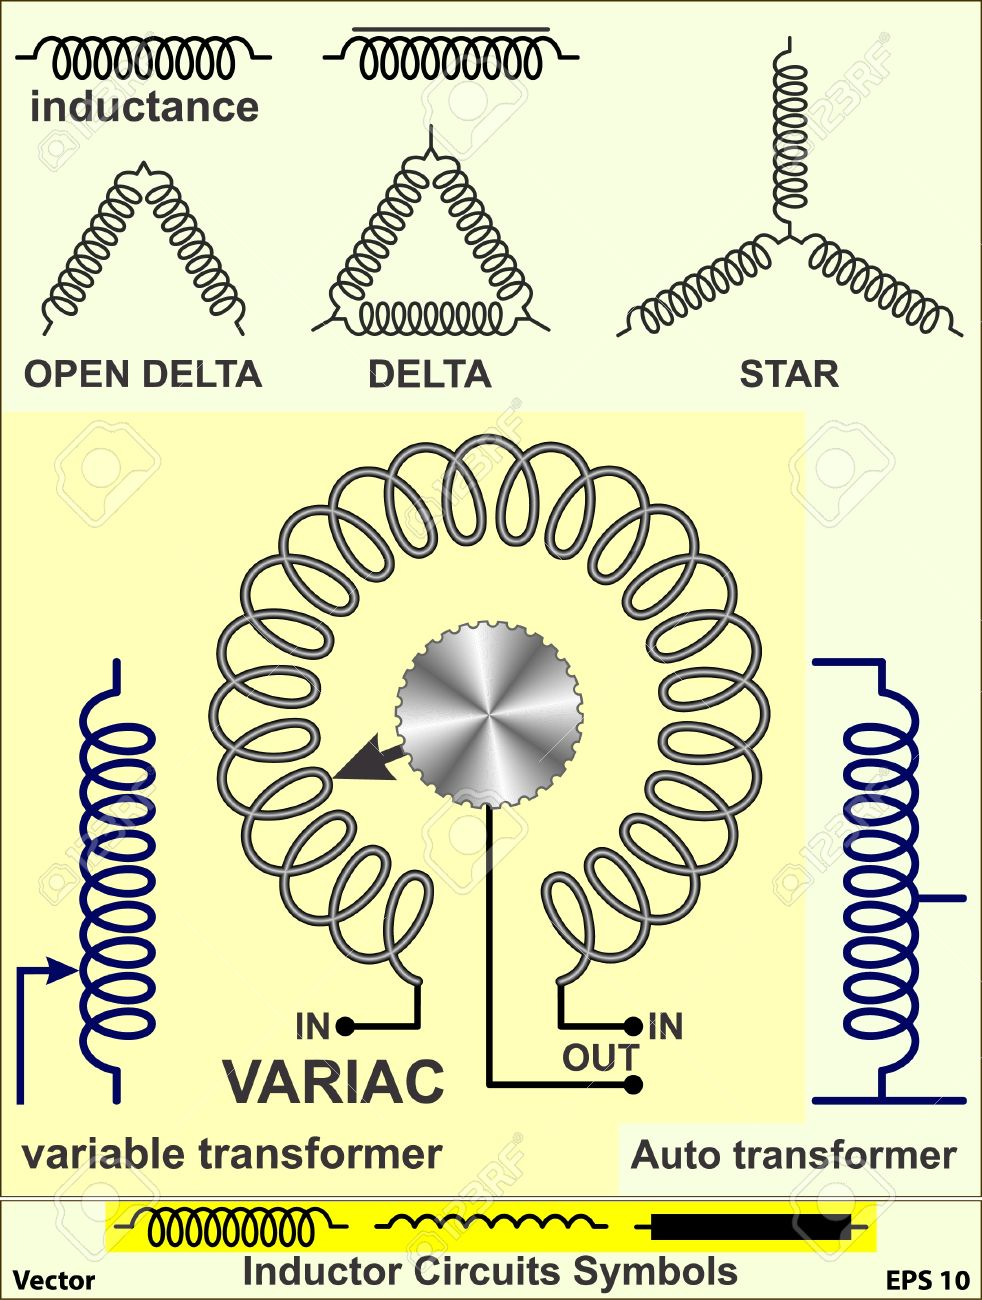 Inductor Circuits Symbols Royalty Free Cliparts, Vectors, And Stock ...